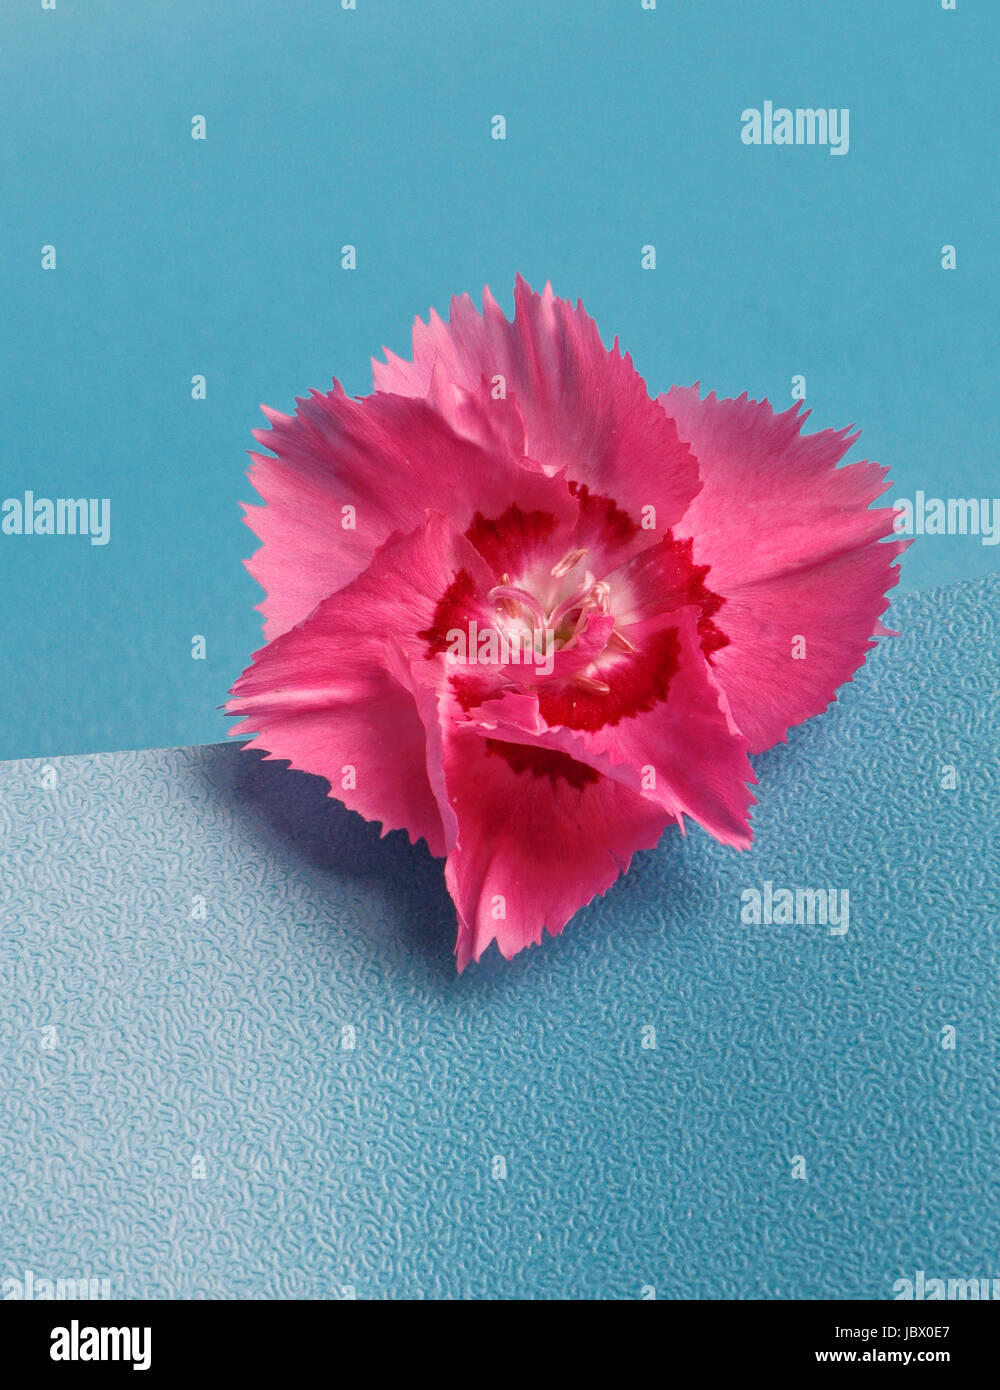 Dianthus carnation. Carophyllaceae. On blue background - Stock Image